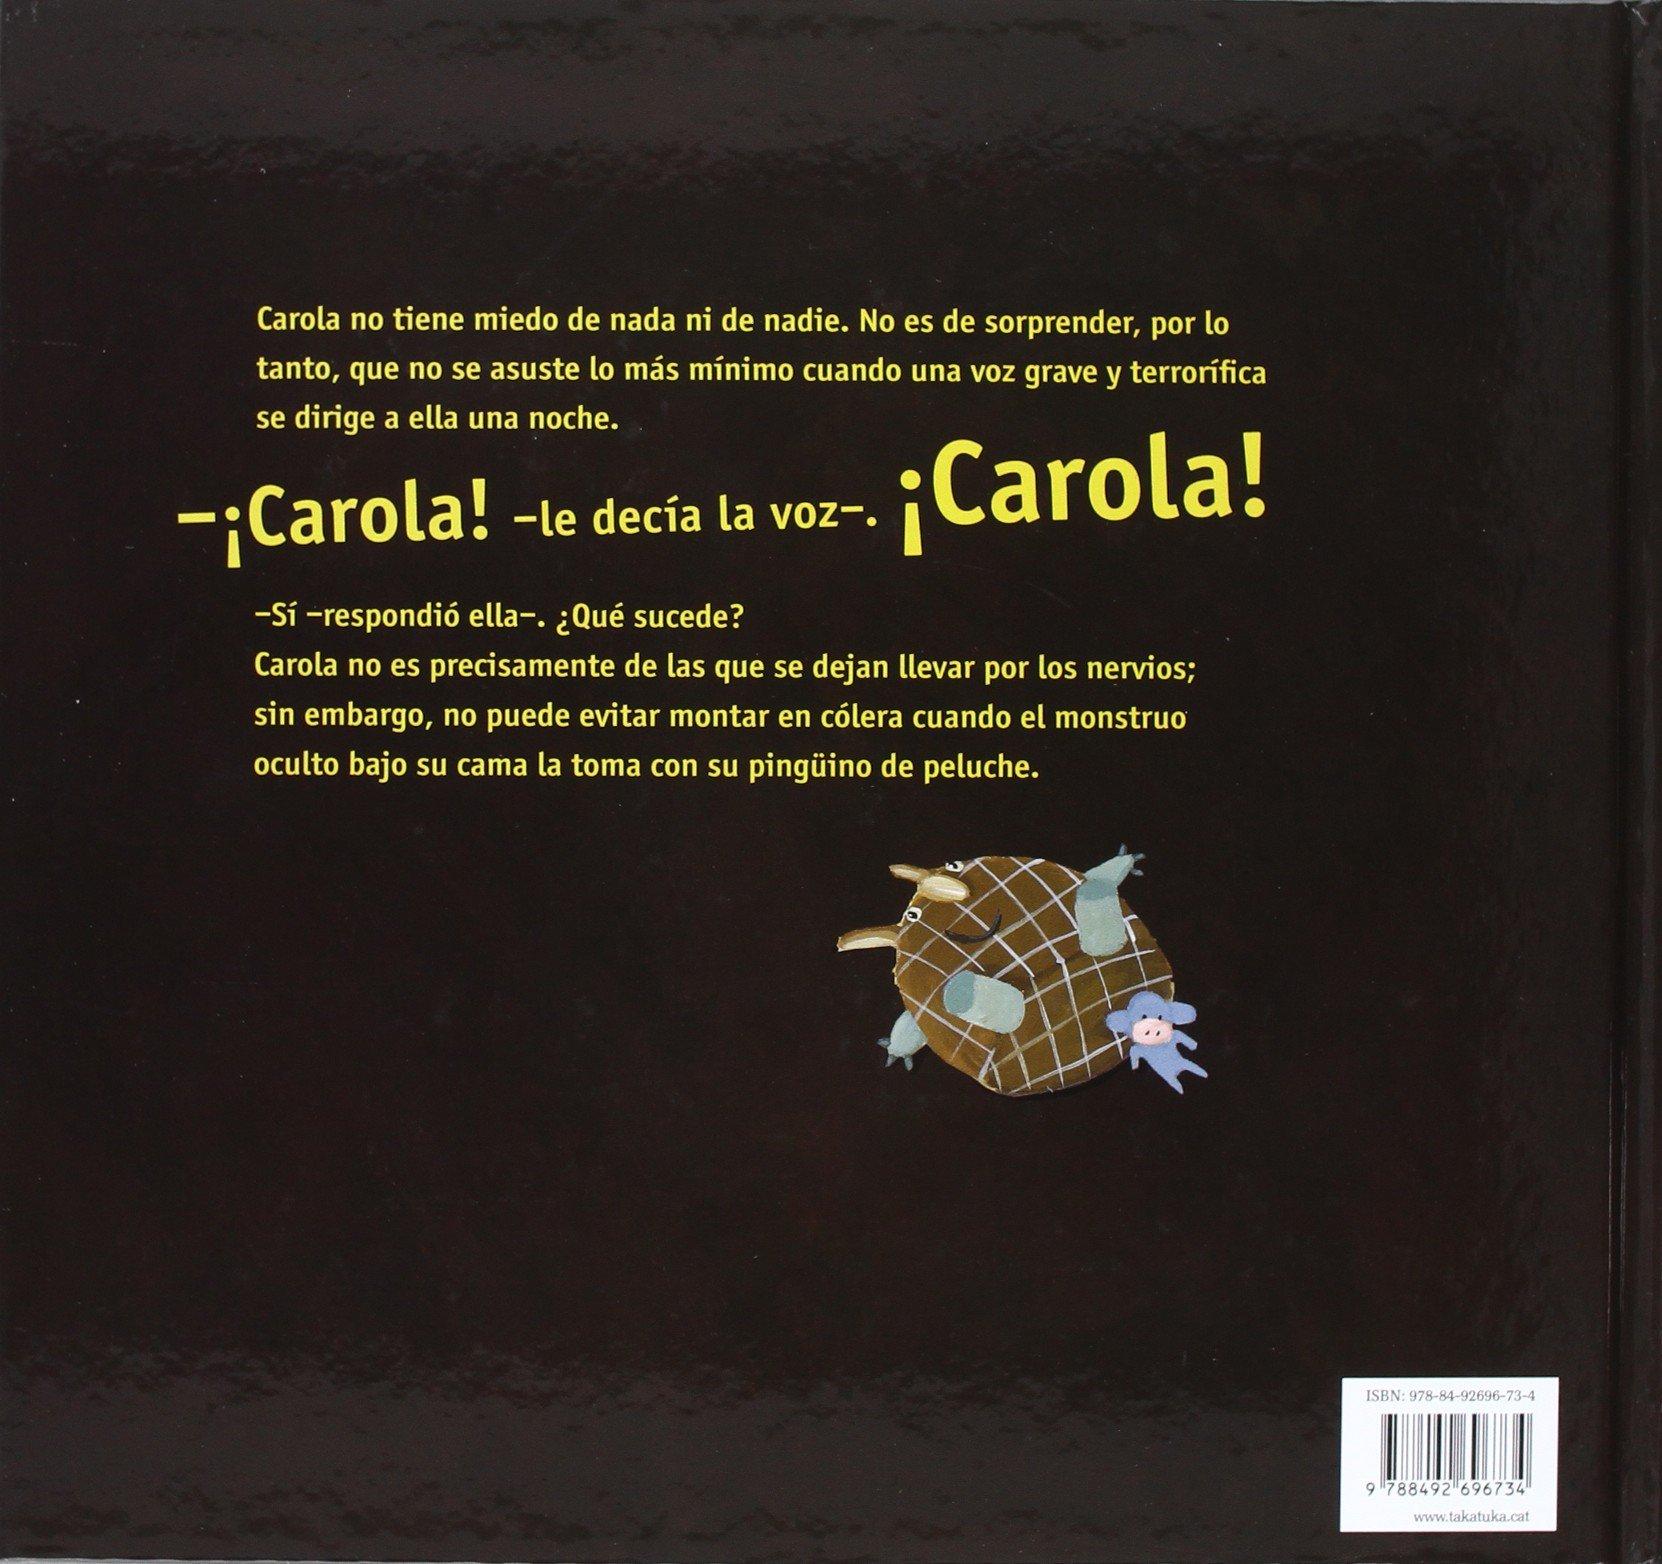 Buenas noches Carola (Spanish Edition): Jakob Hein, Takatuka, Kurt Kromer: 9788492696734: Amazon.com: Books